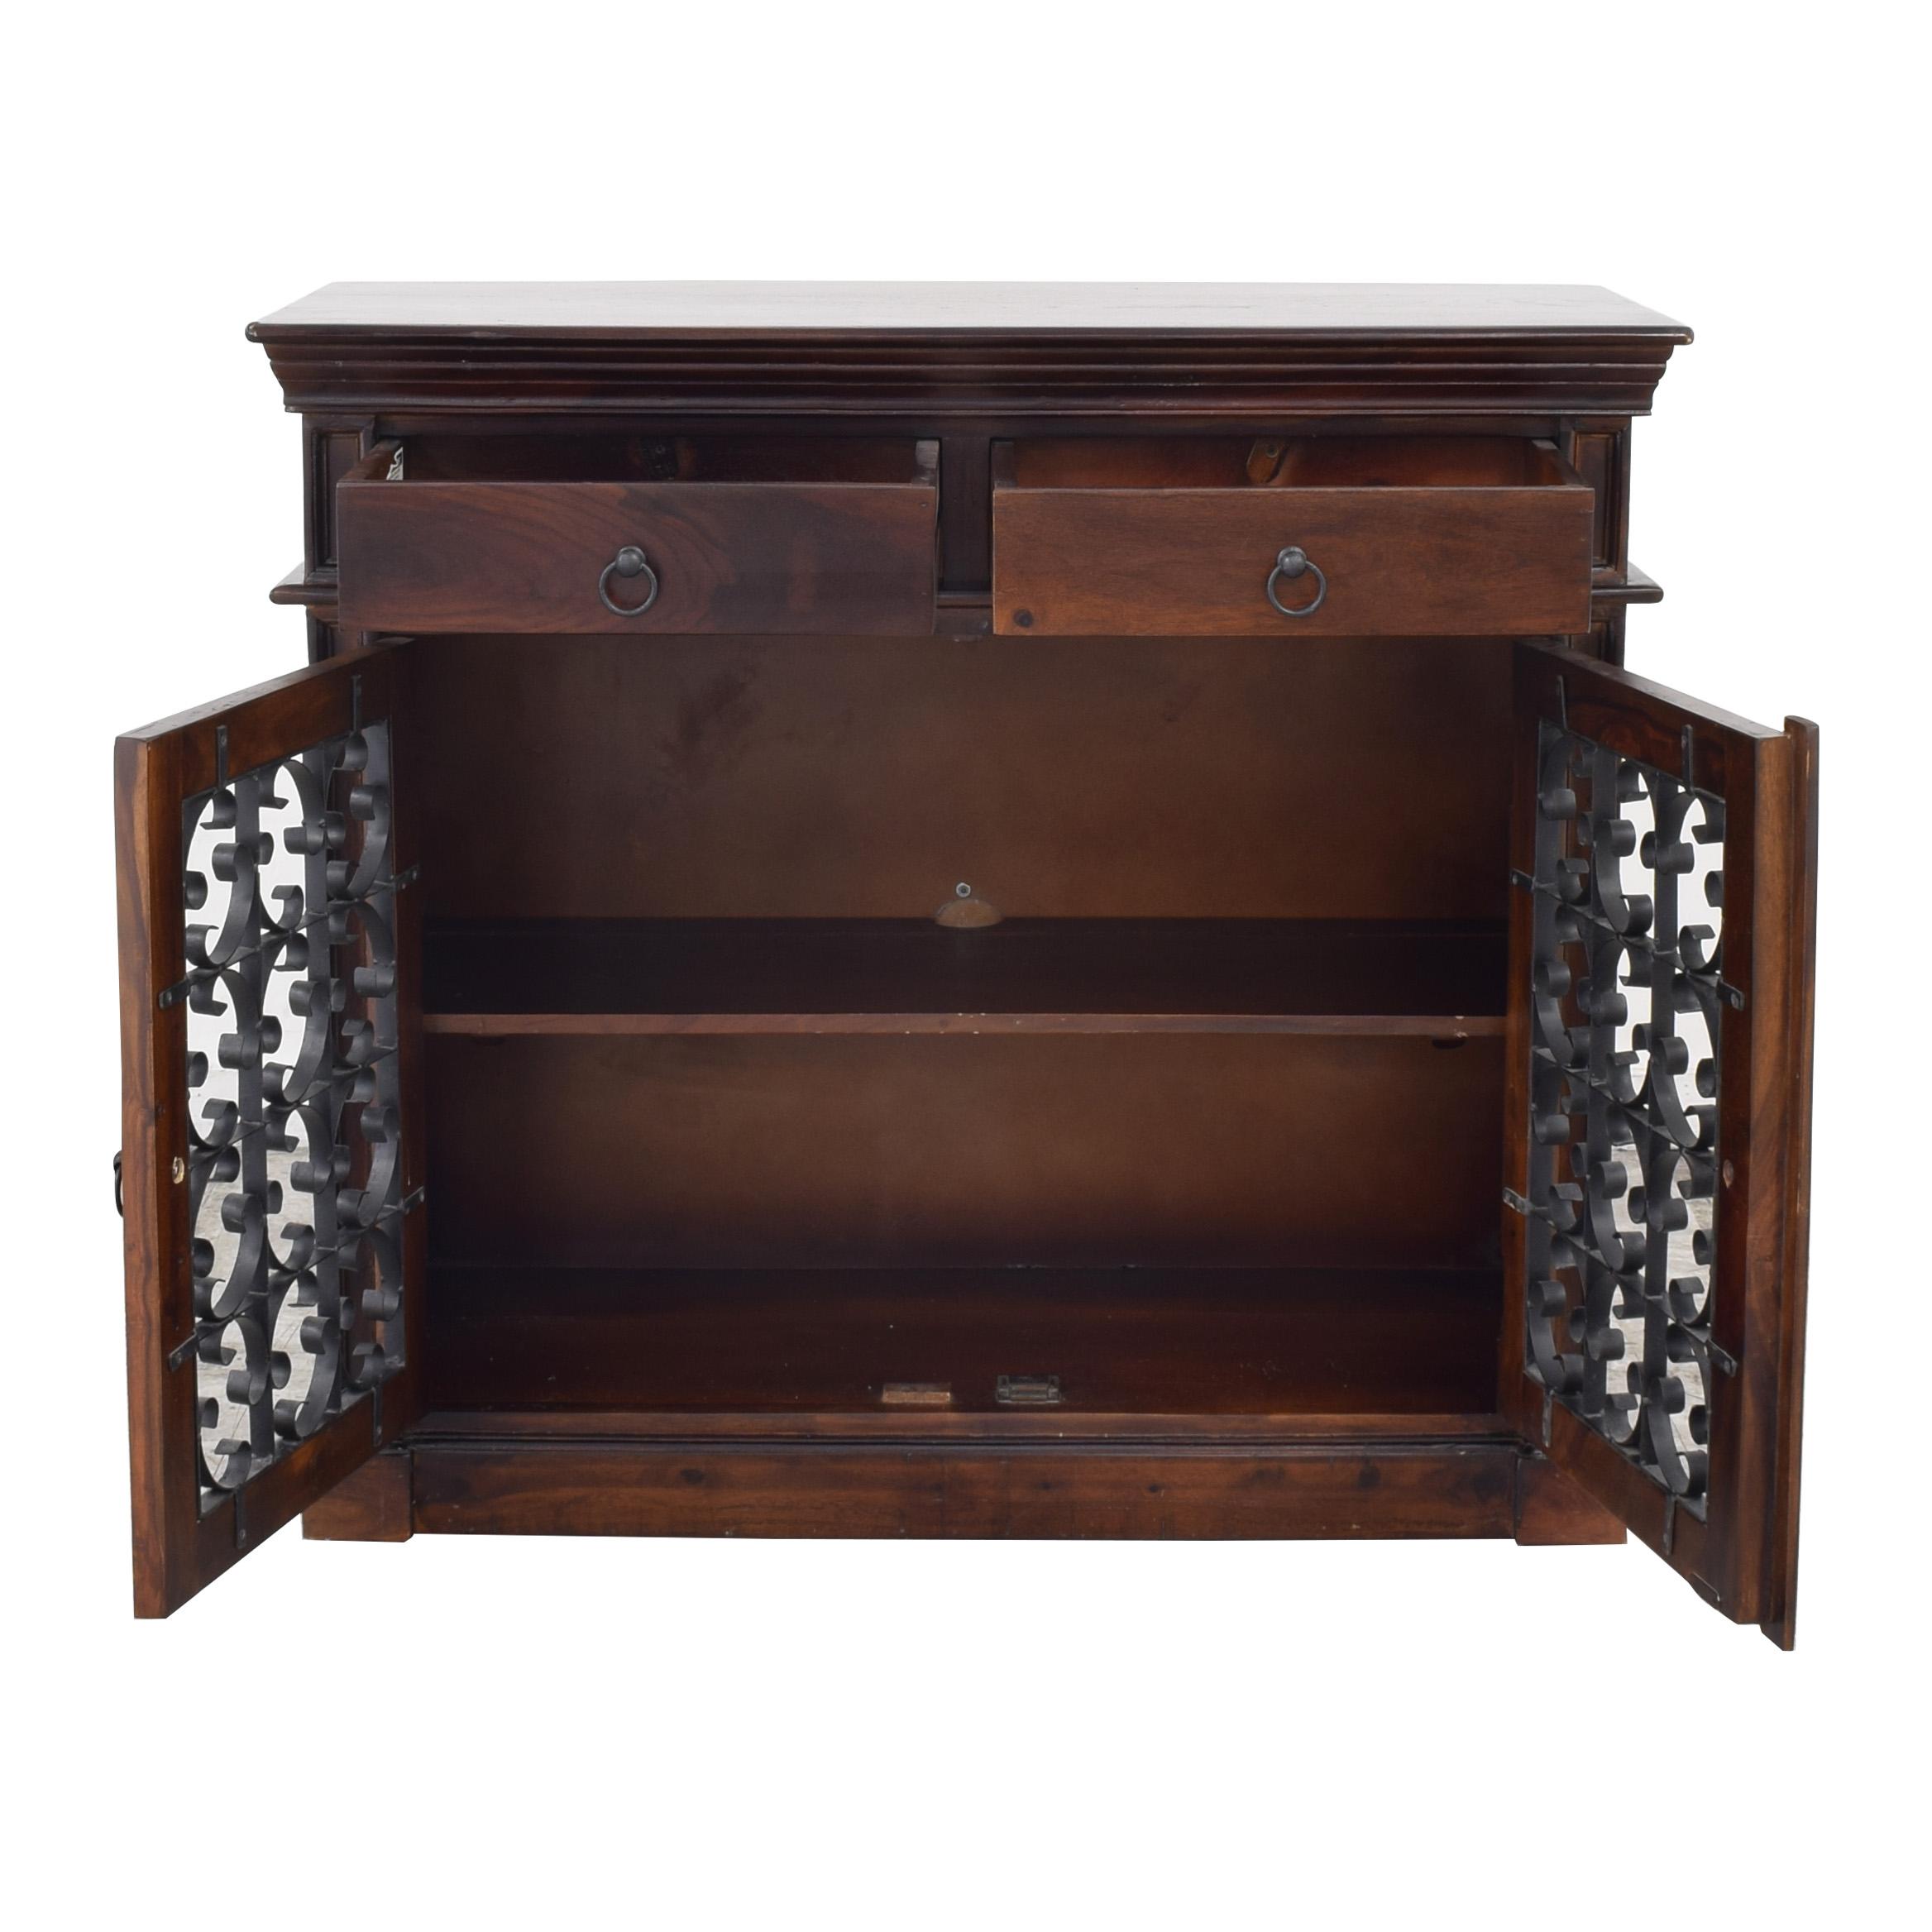 buy Pier 1 Pier 1 Bar Cabinet online